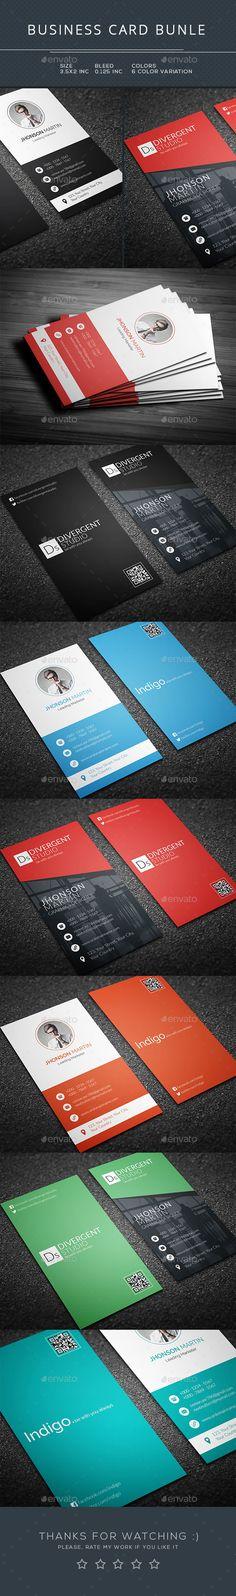 Creative business cards bundle template design download http creative business cards bundle template design download httpgraphicriveritemcreative business cards bundle12071705refksioks pinterest flashek Choice Image